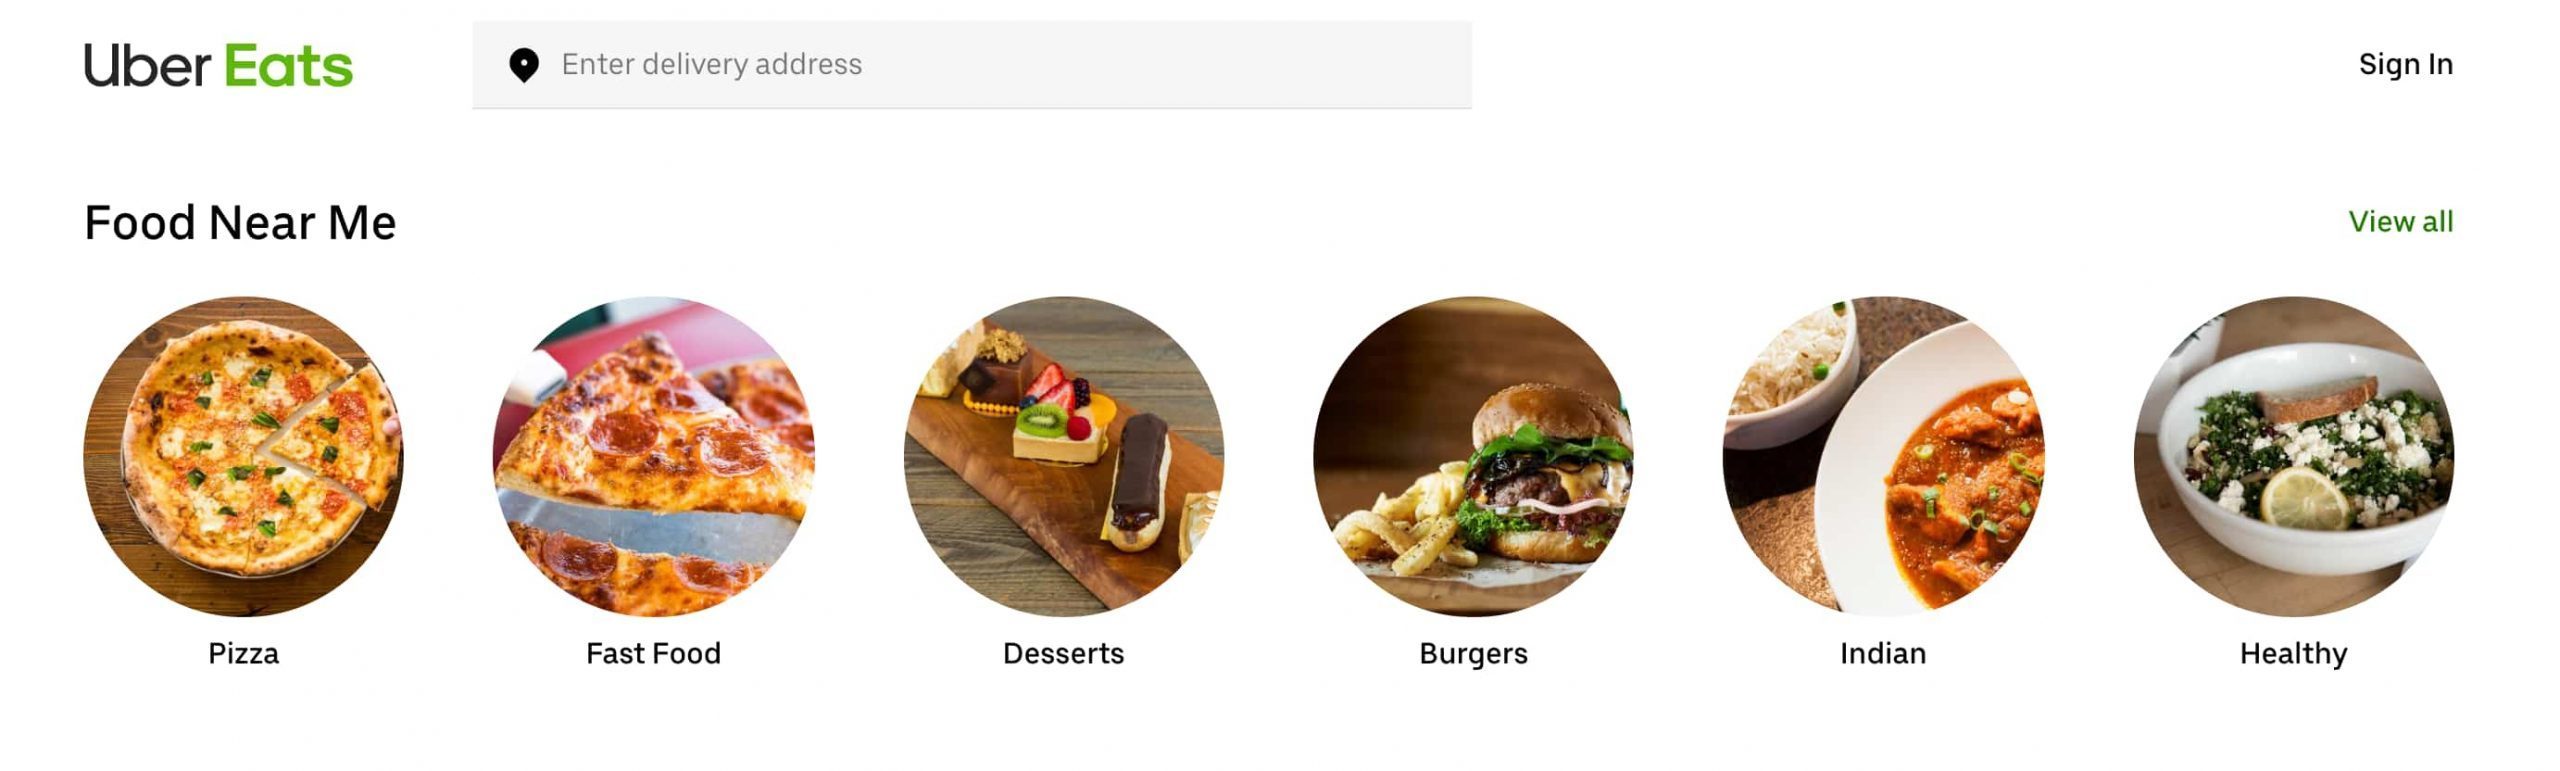 Uber Eats Dubai location based suggestions